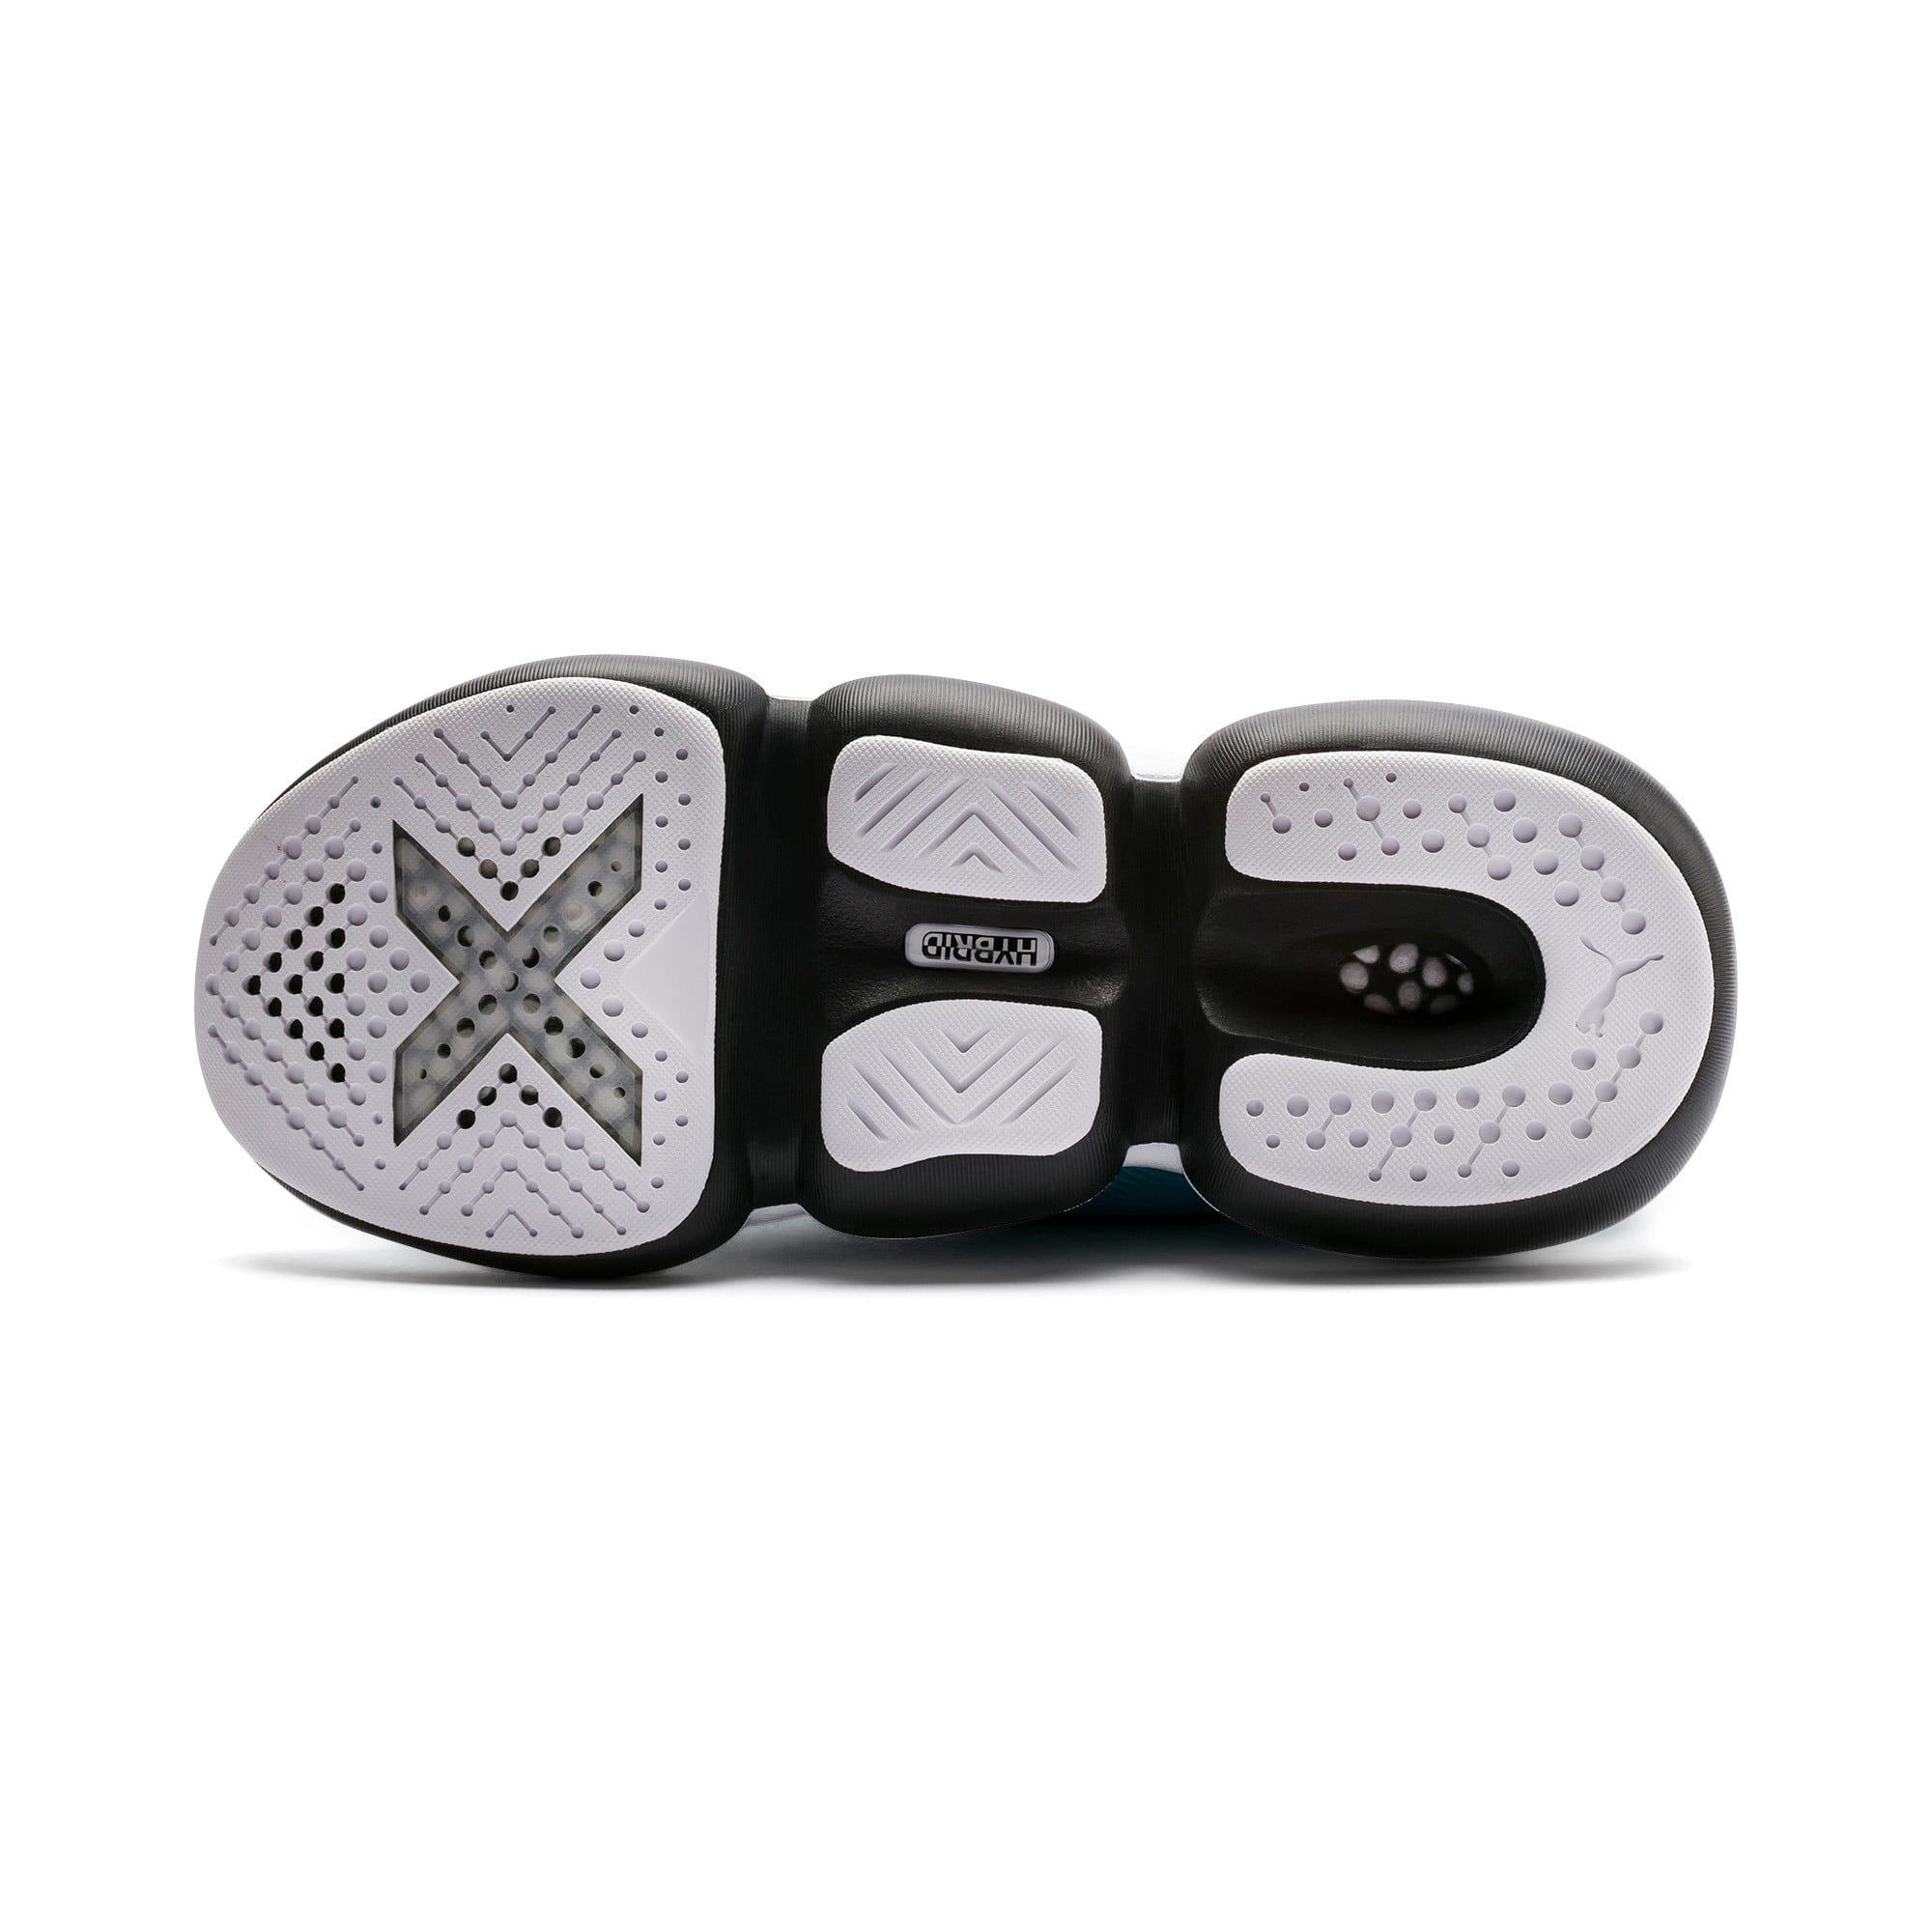 Thumbnail 5 of Mode XT Trailblazer Iridescent Women's Training Shoes, Caribbean Sea-Puma White, medium